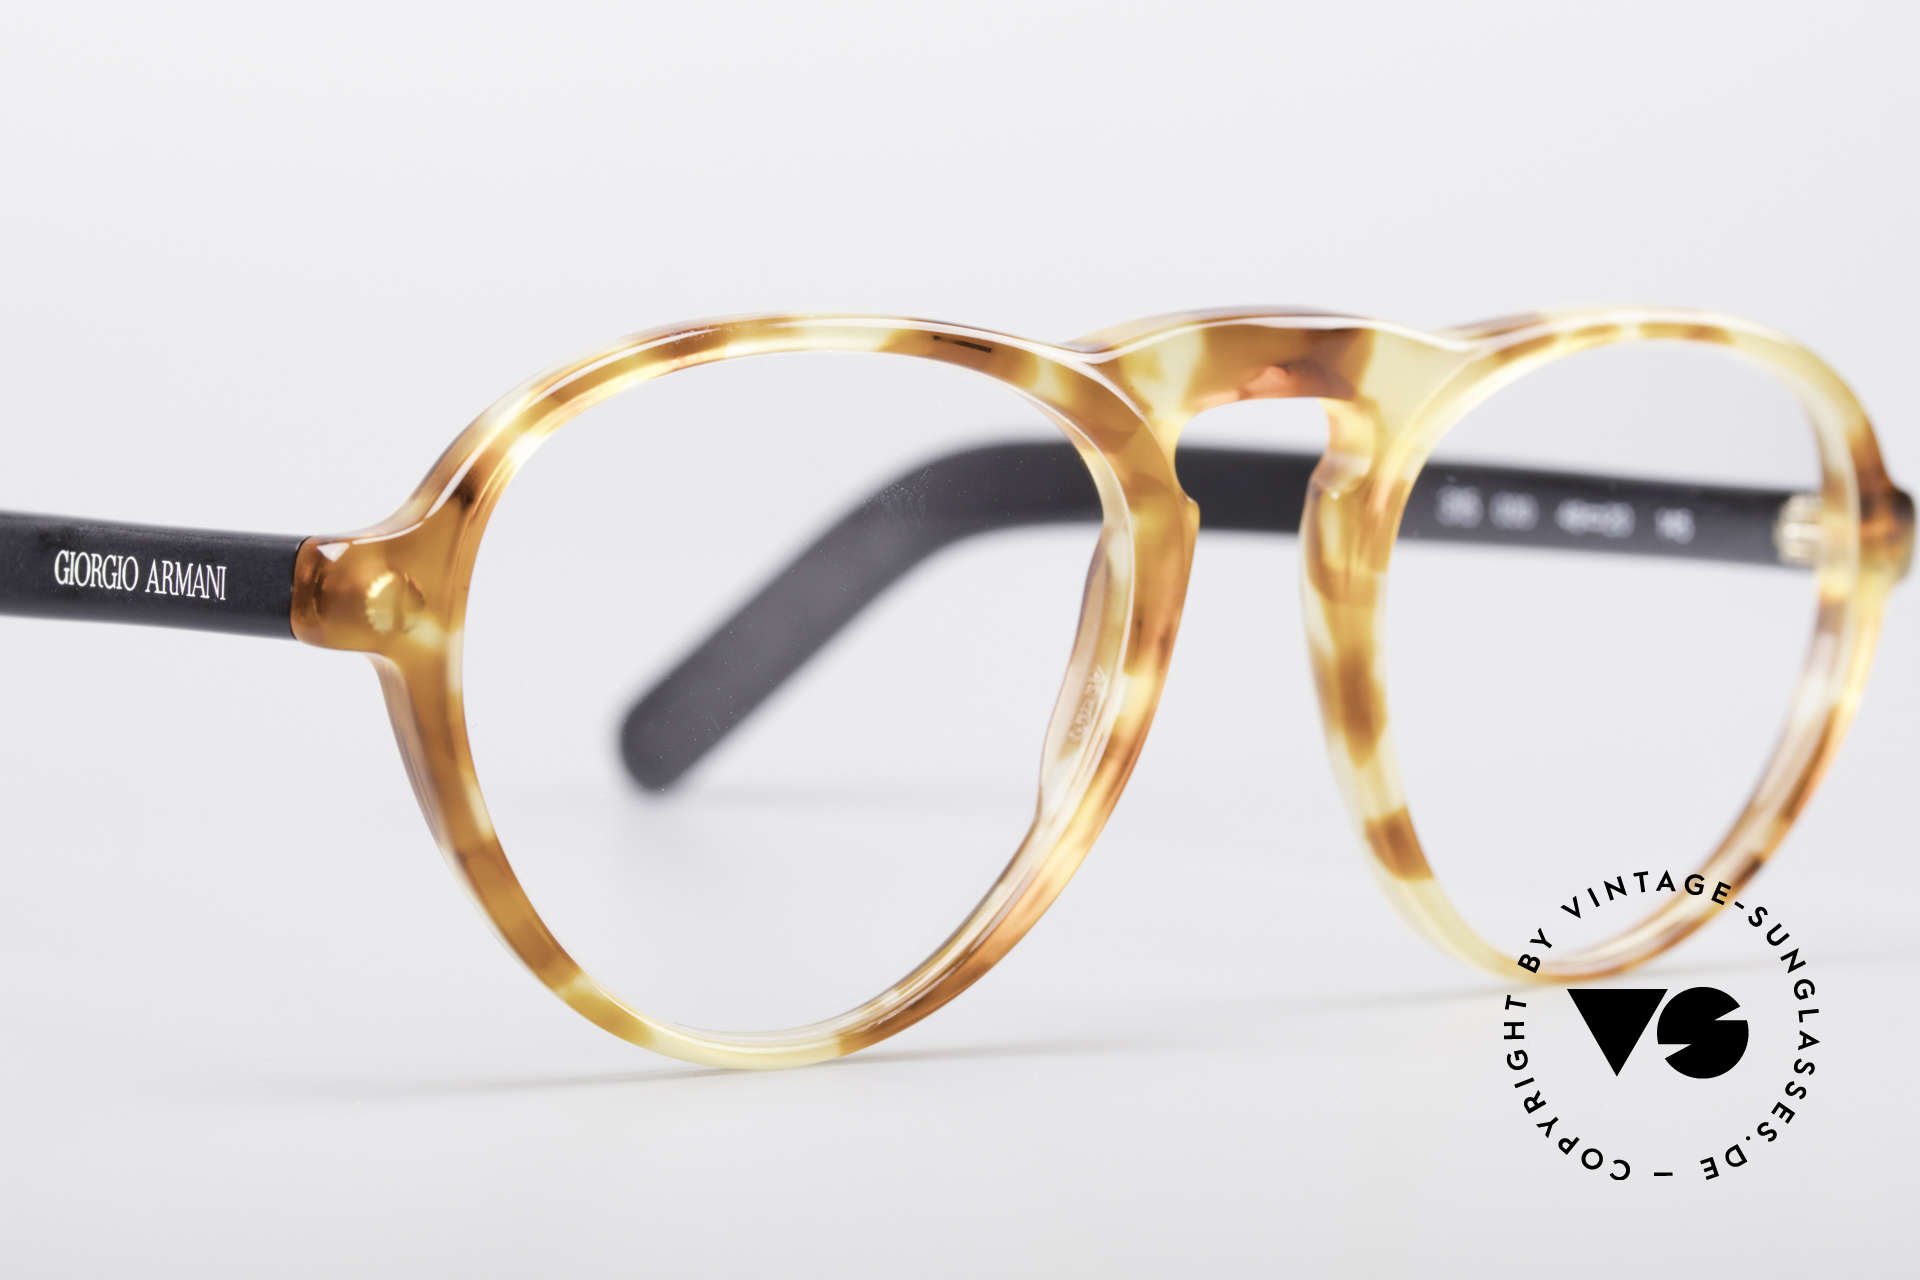 Giorgio Armani 315 True Vintage Eyeglass Frame, unworn (like all our vintage Giorgio Armani specs), Made for Men